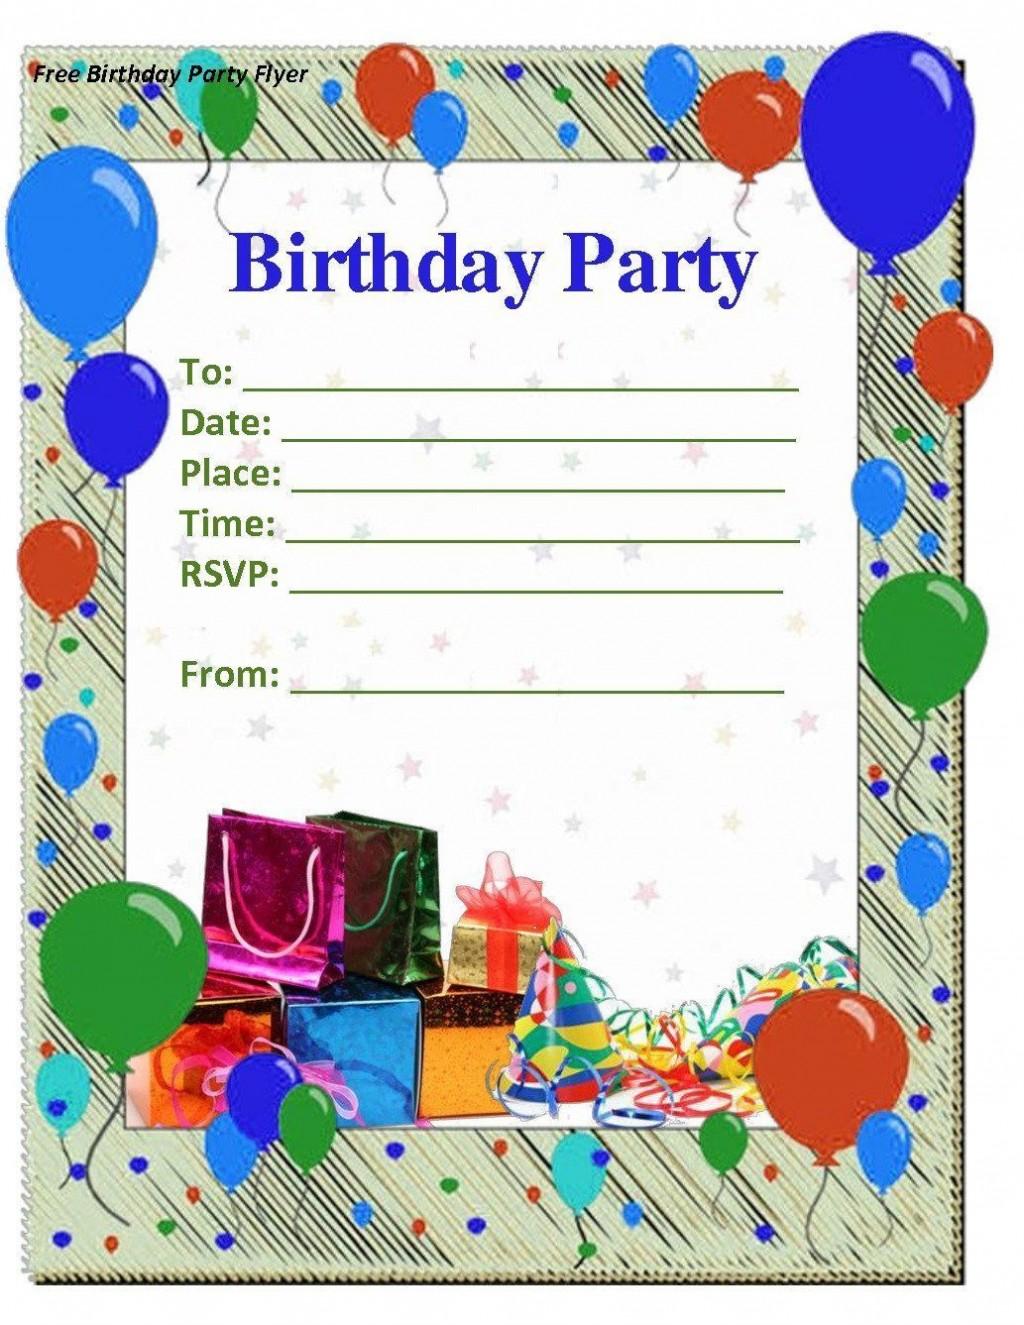 008 Amazing Microsoft Word Birthday Invitation Template Idea  Editable 50th 60thLarge